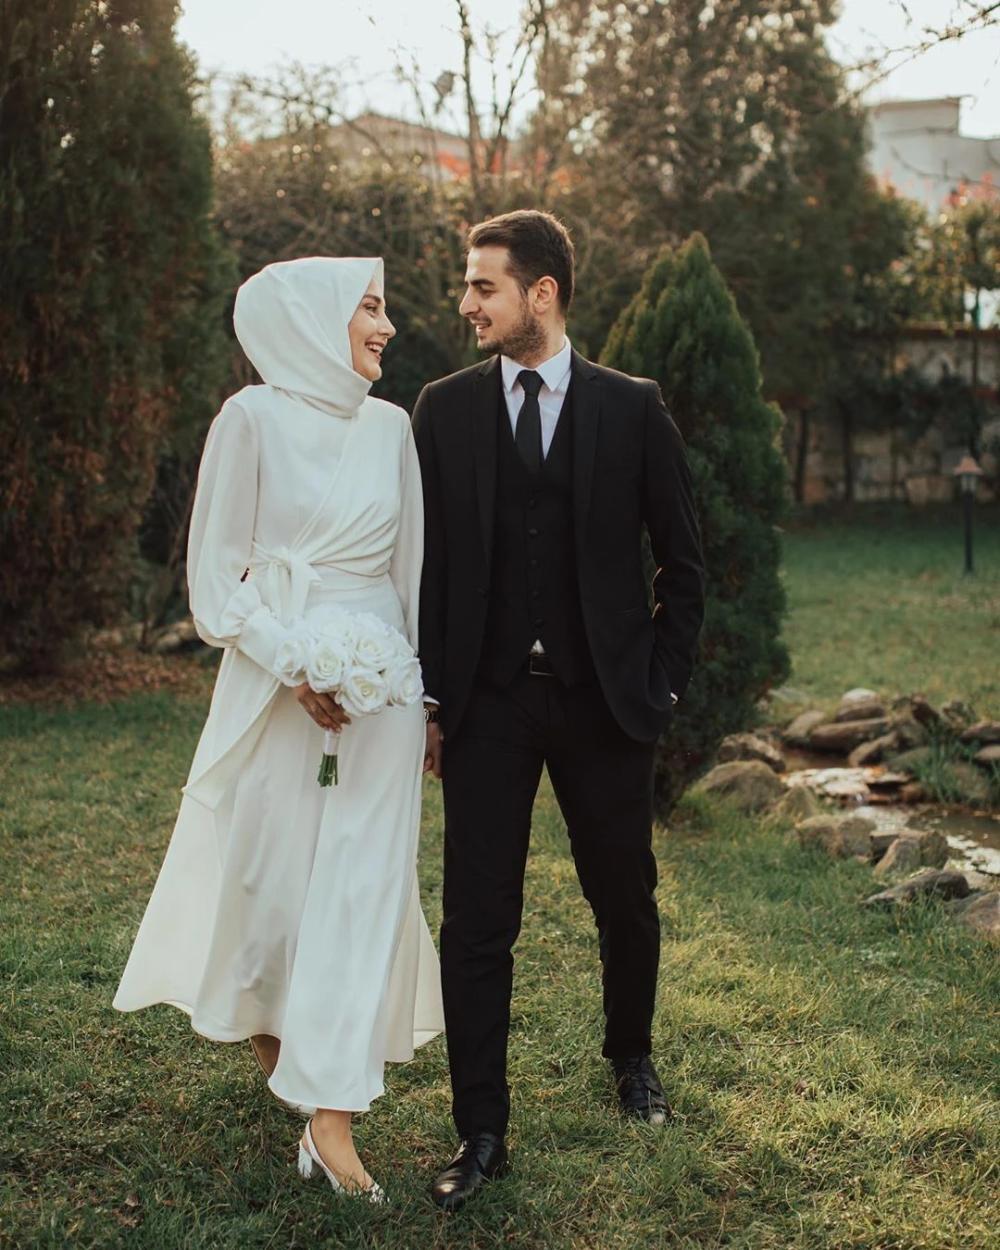 For Solemnization Dress Gaun Pengantin Ekor Panjang Pakaian Pernikahan Gaun Perkawinan [ 1037 x 1037 Pixel ]